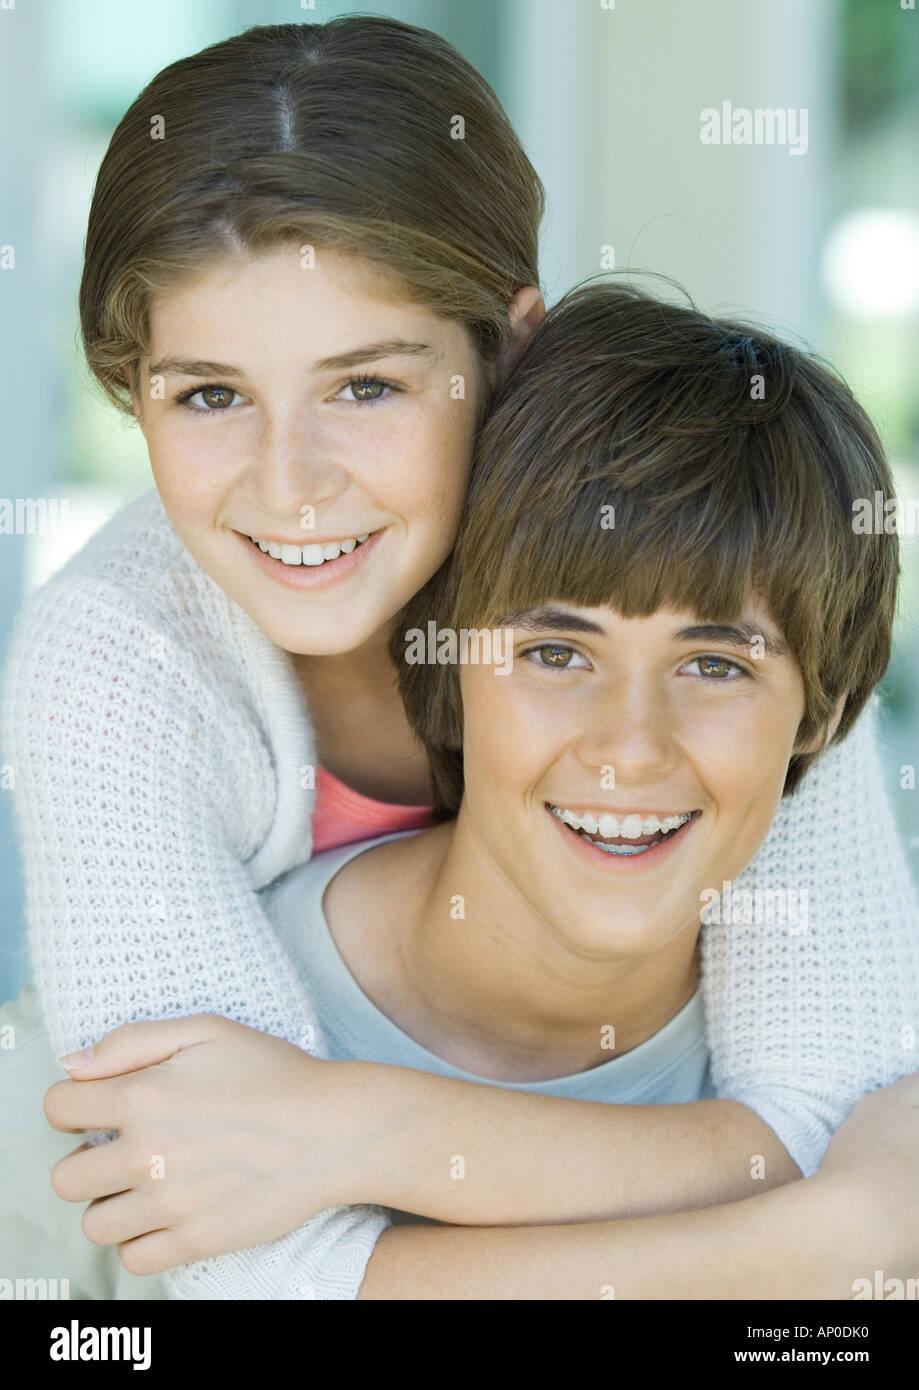 pimpandhost ru onion @ $ pimpandhost ru onion @ $librechan girls preteen couples Girl hugging  preteen boy from behind,